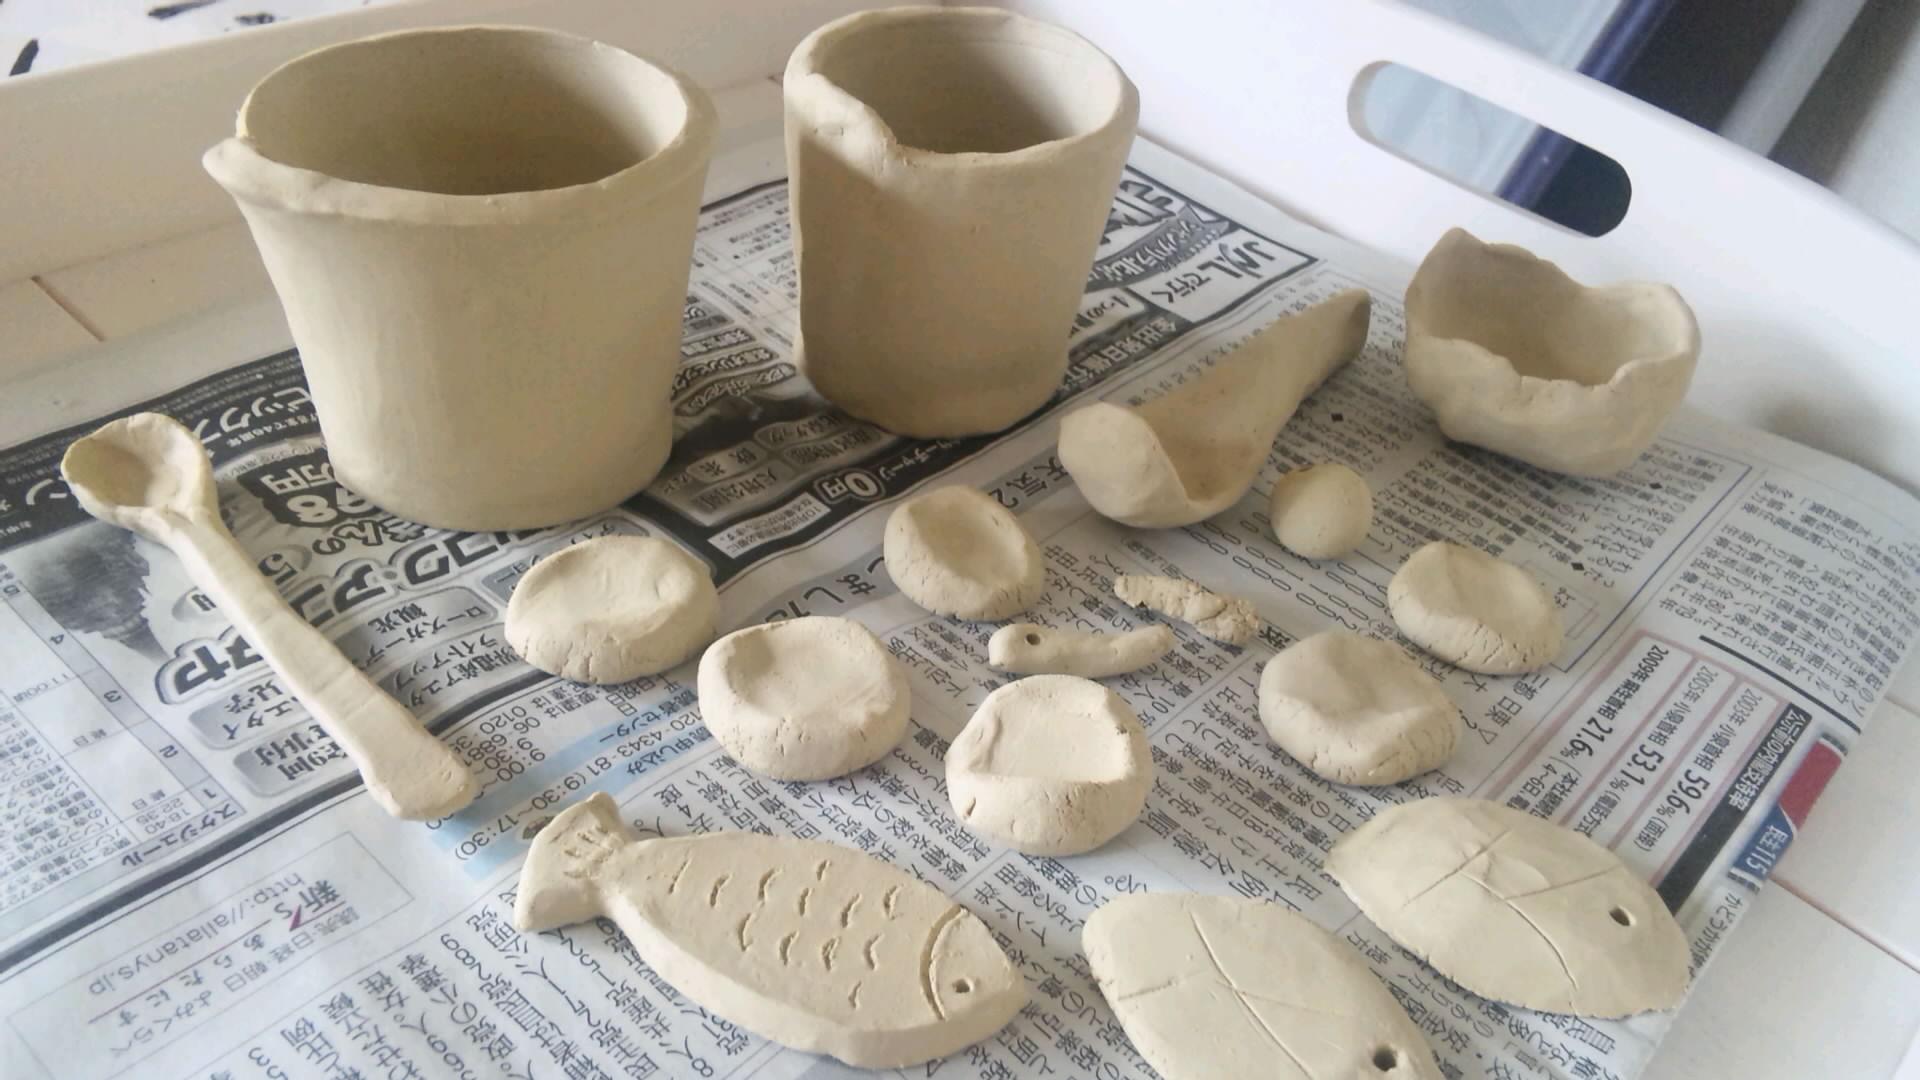 オーブン粘土教室